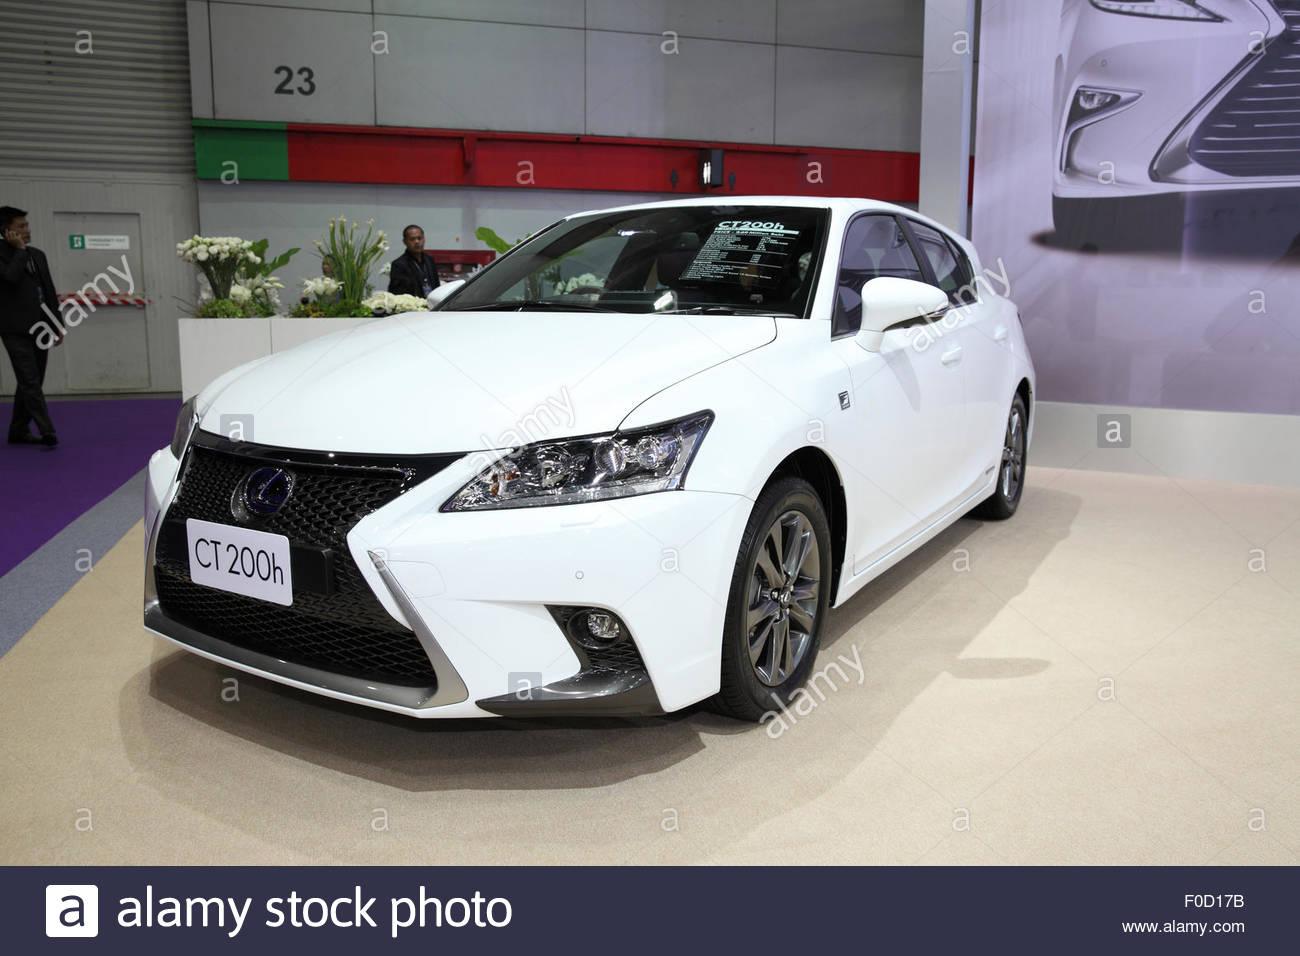 rc lexus sale f in la listings vehicle image mandeville make for